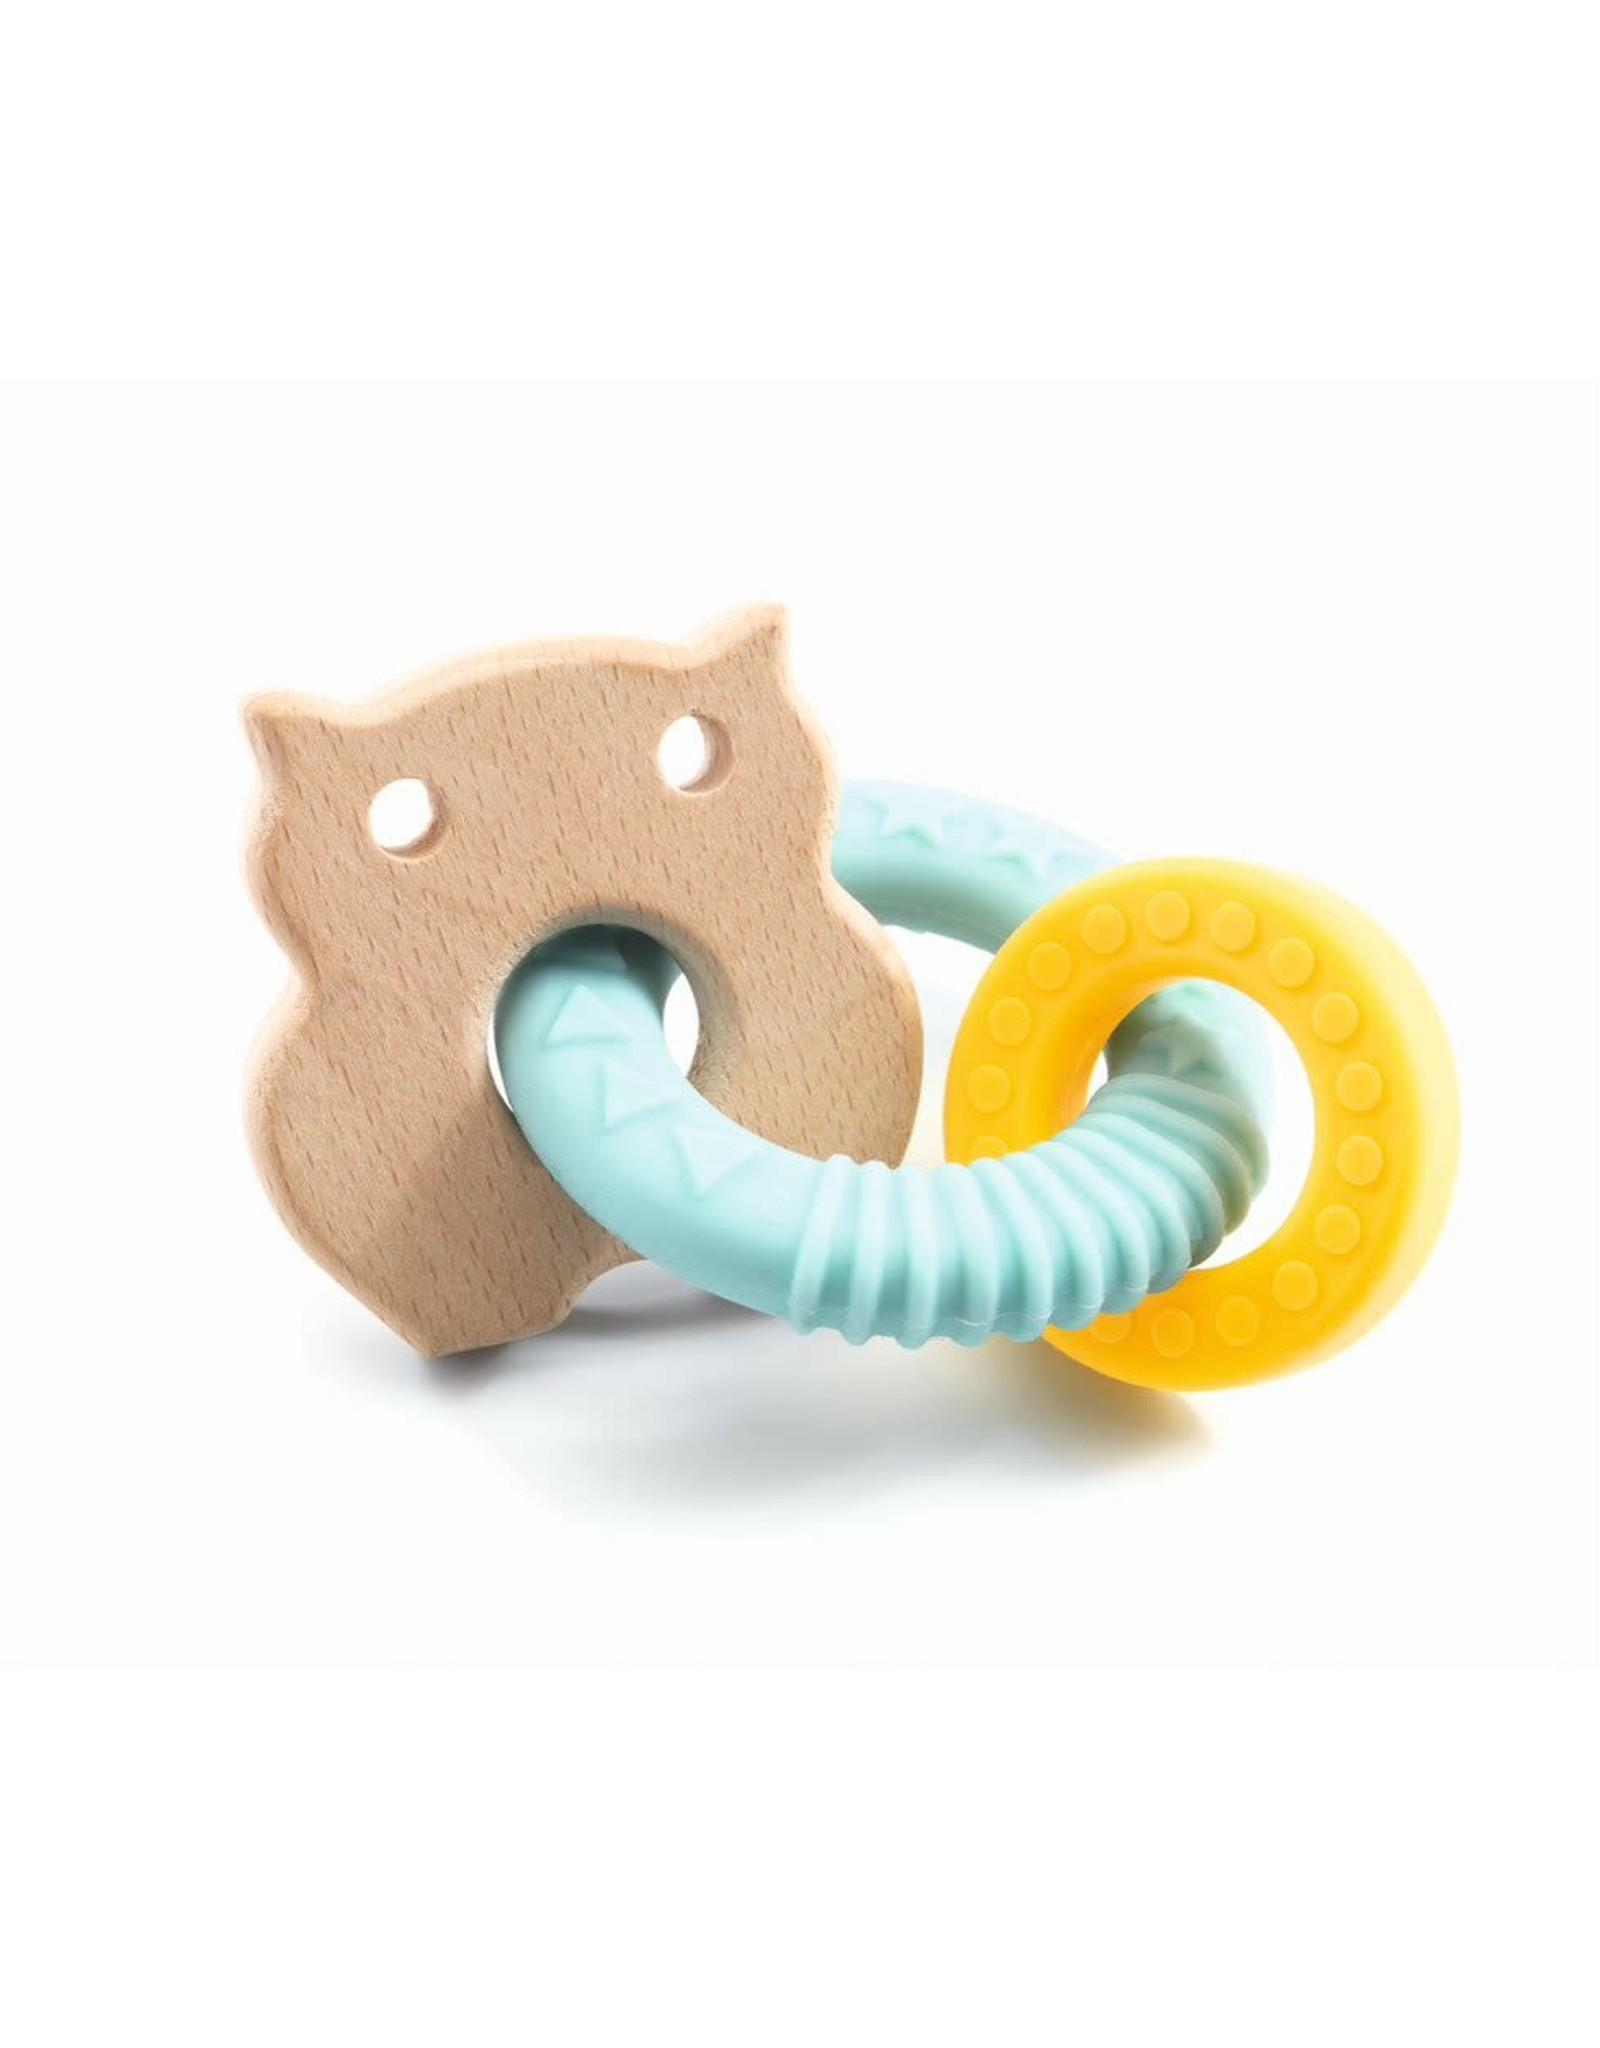 Djeco BabyBobi Teething Toy